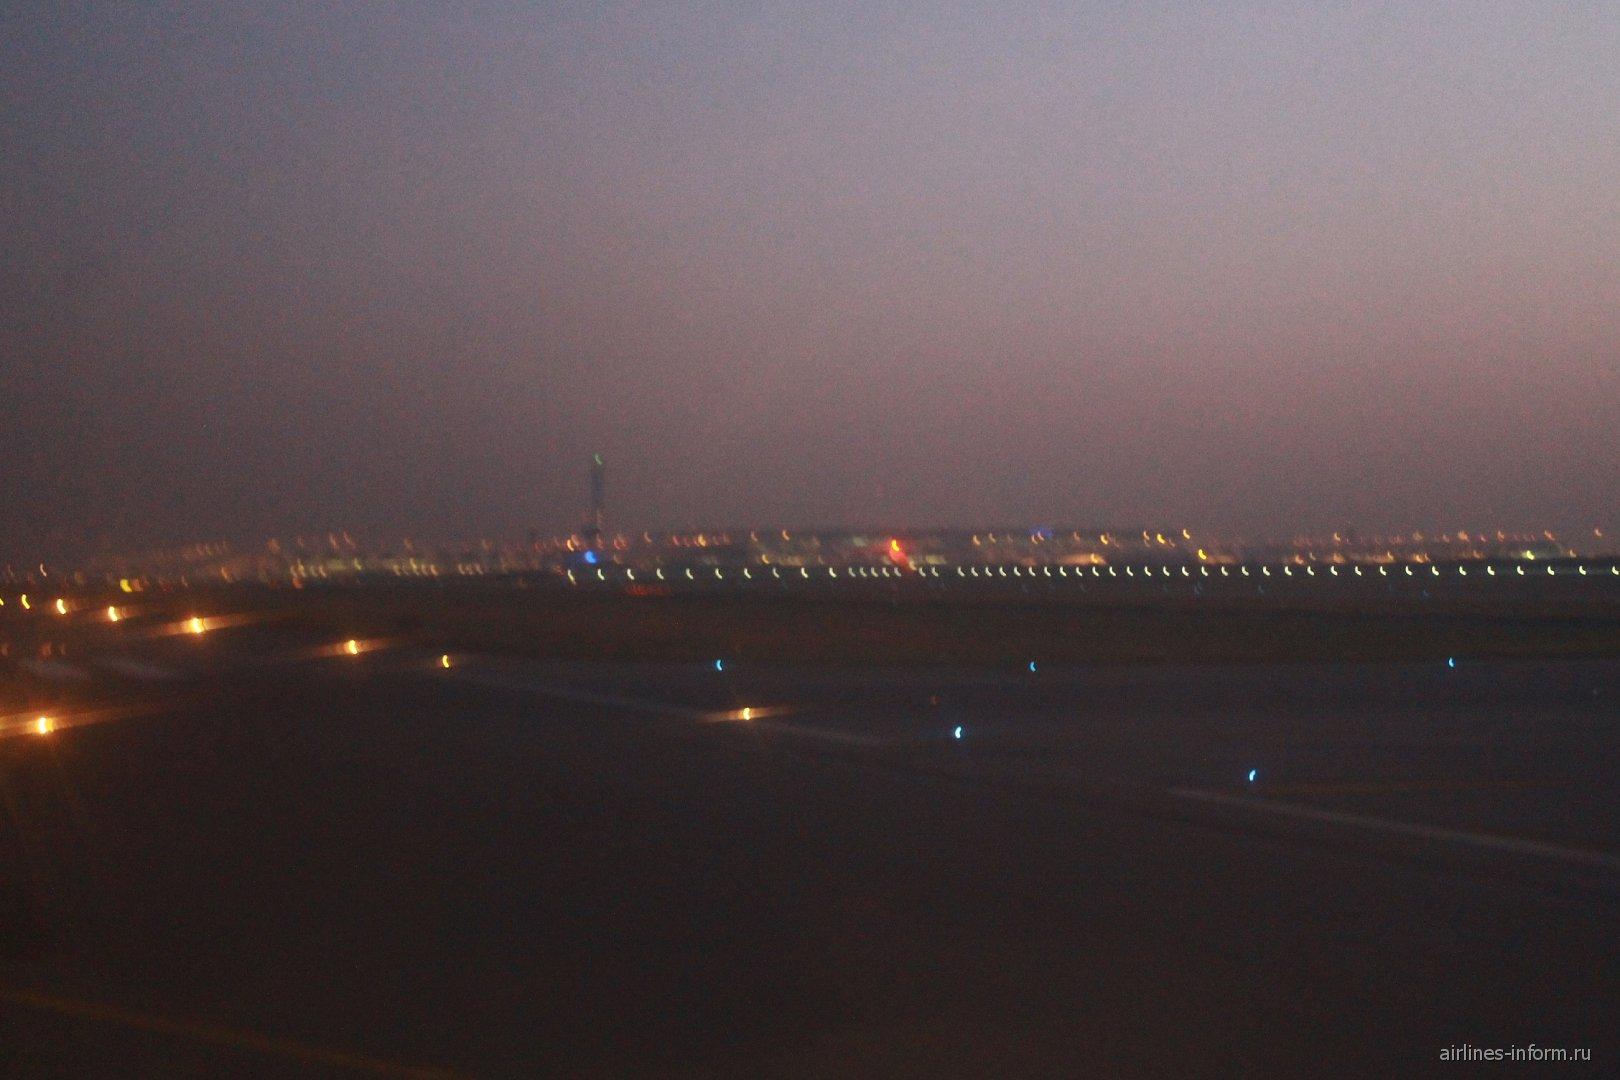 Bangkog international airport overview